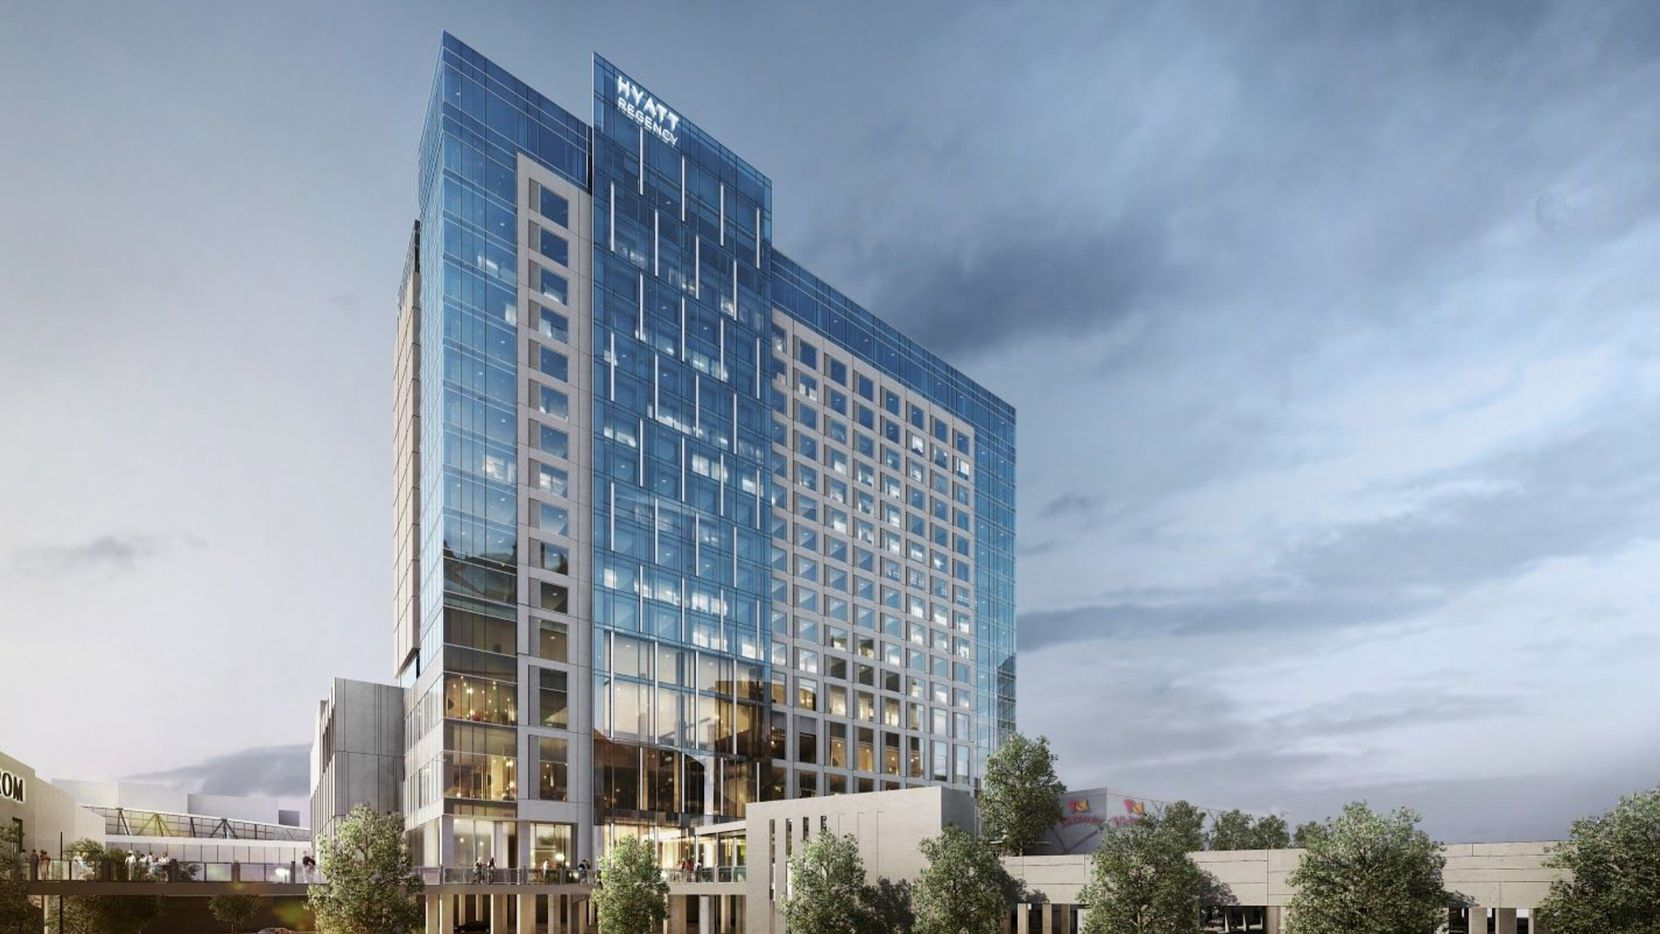 The 18-story Hyatt Regency Stonebriar will have more than 300 rooms.